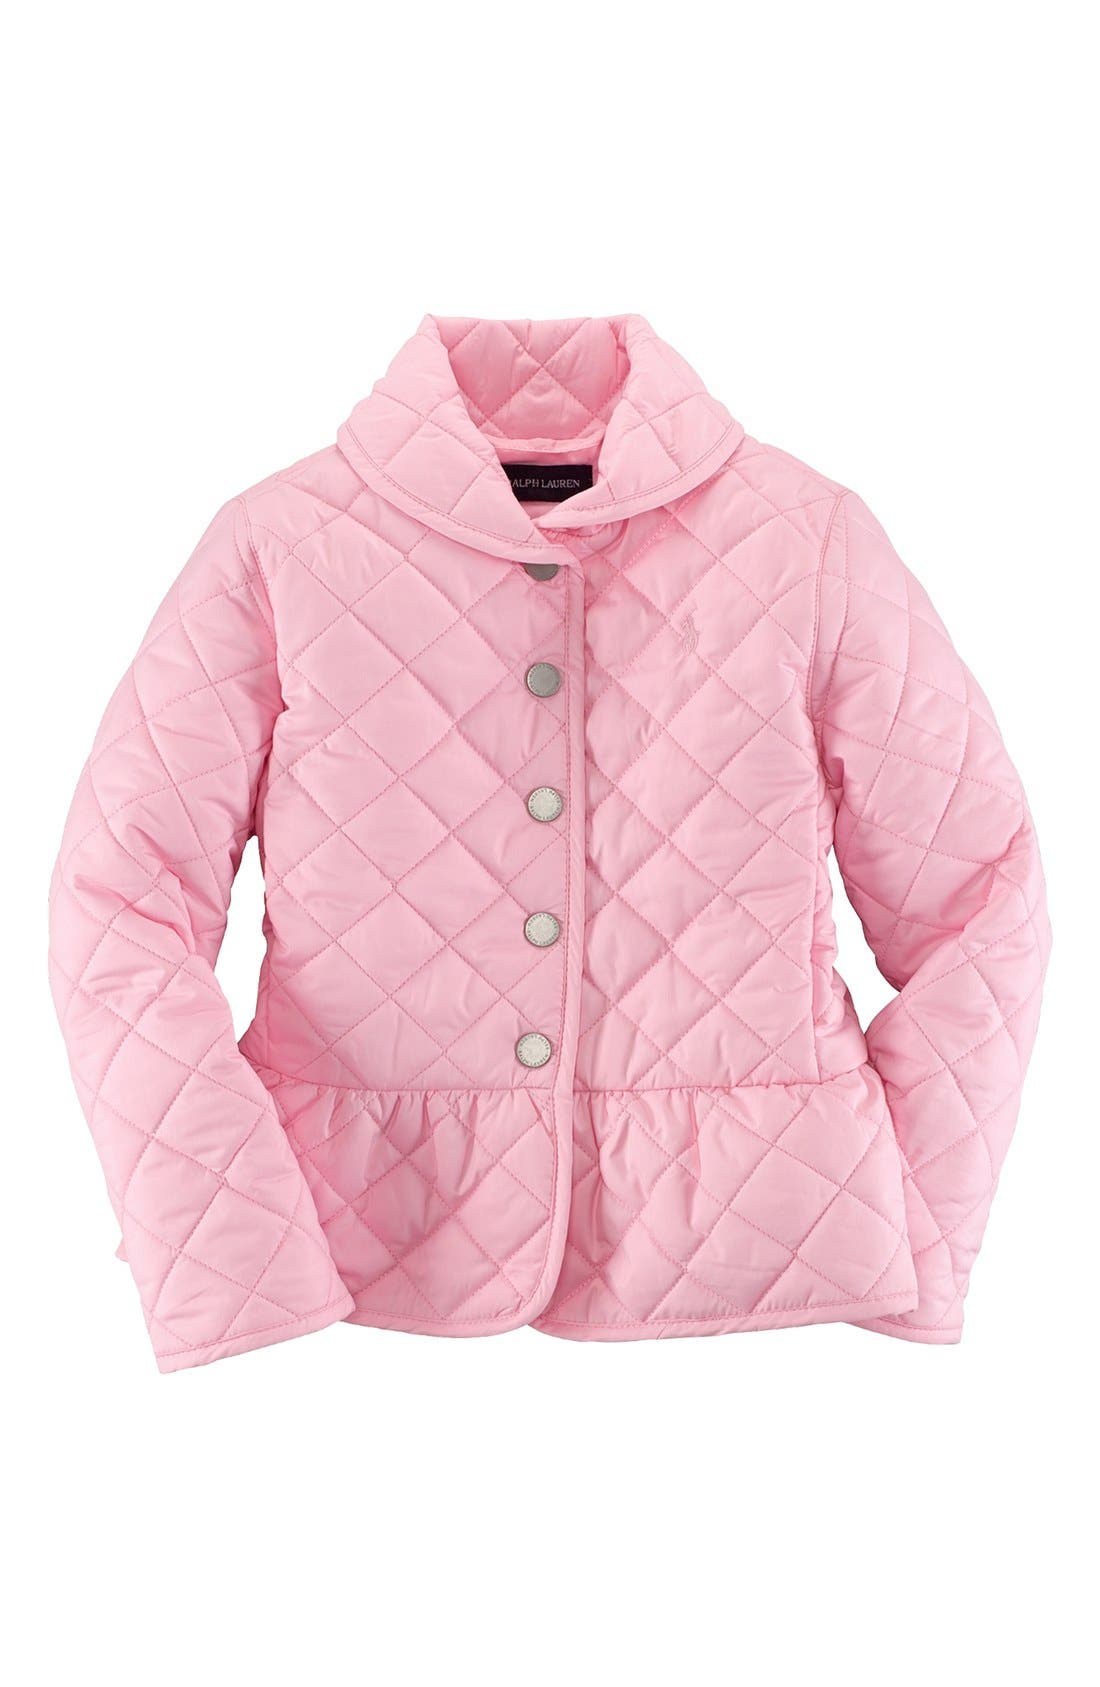 Alternate Image 1 Selected - Ralph Lauren Quilted Peplum Jacket (Toddler Girls)